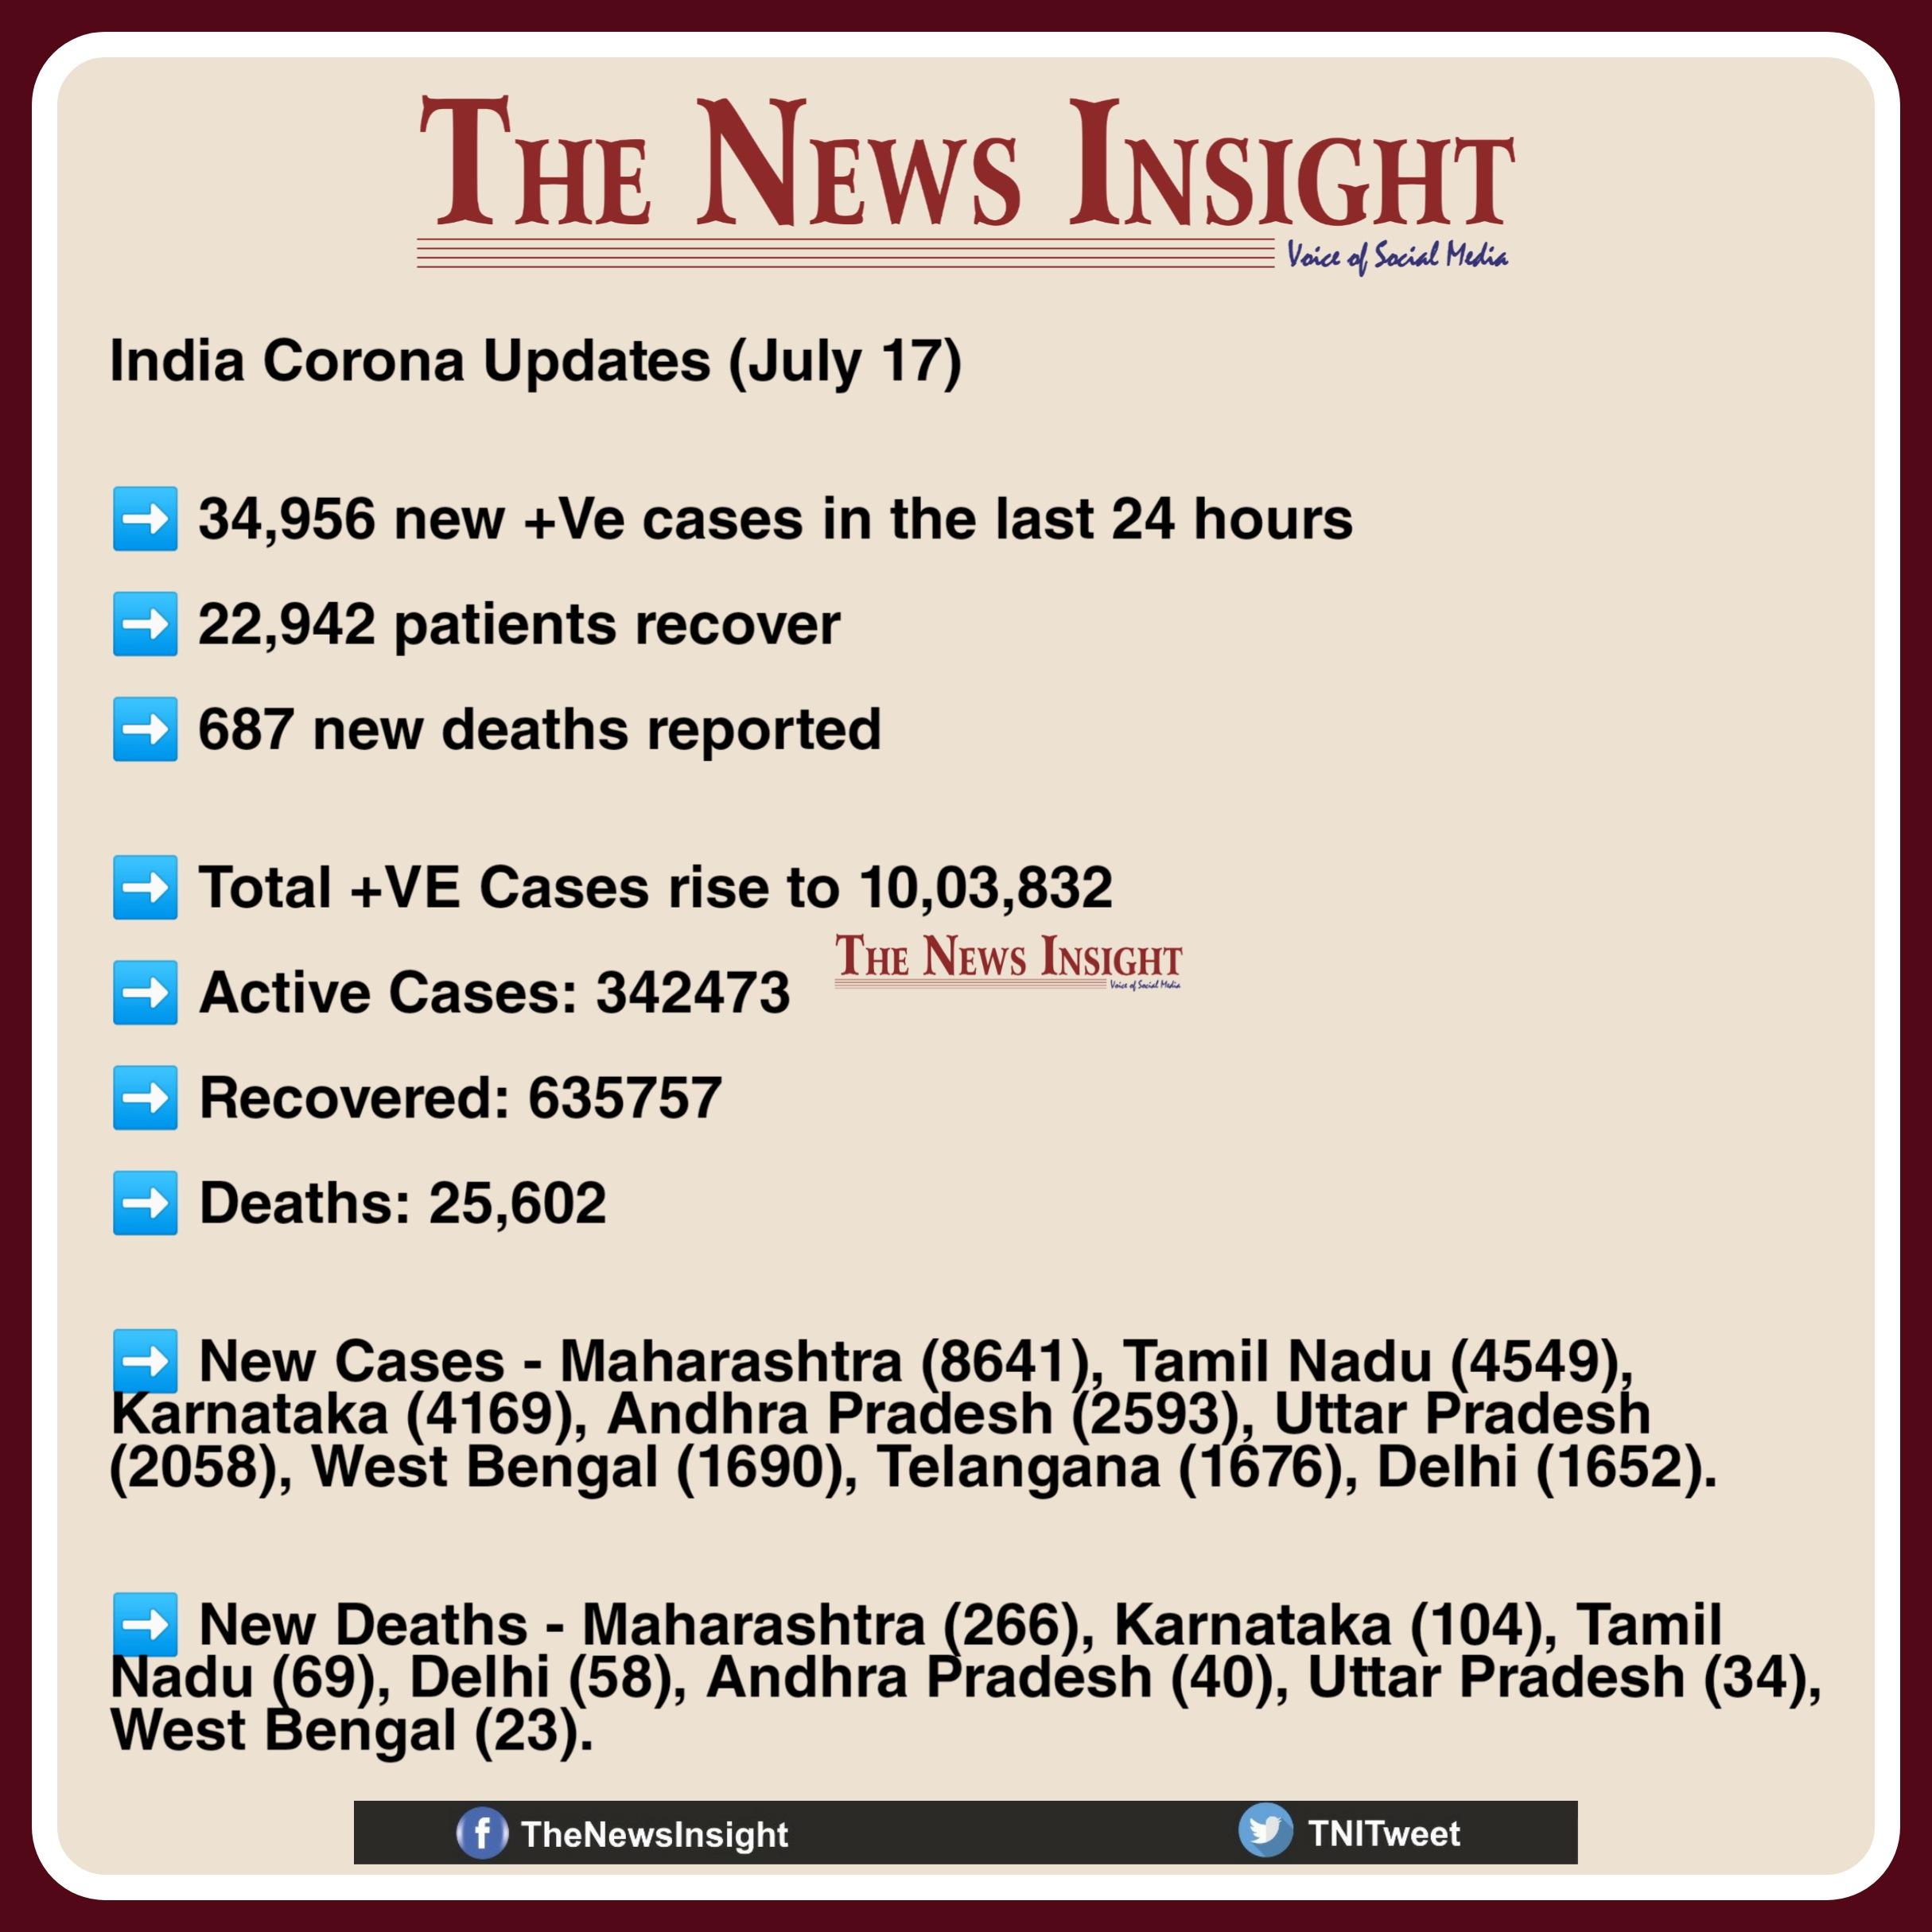 India Corona Updates